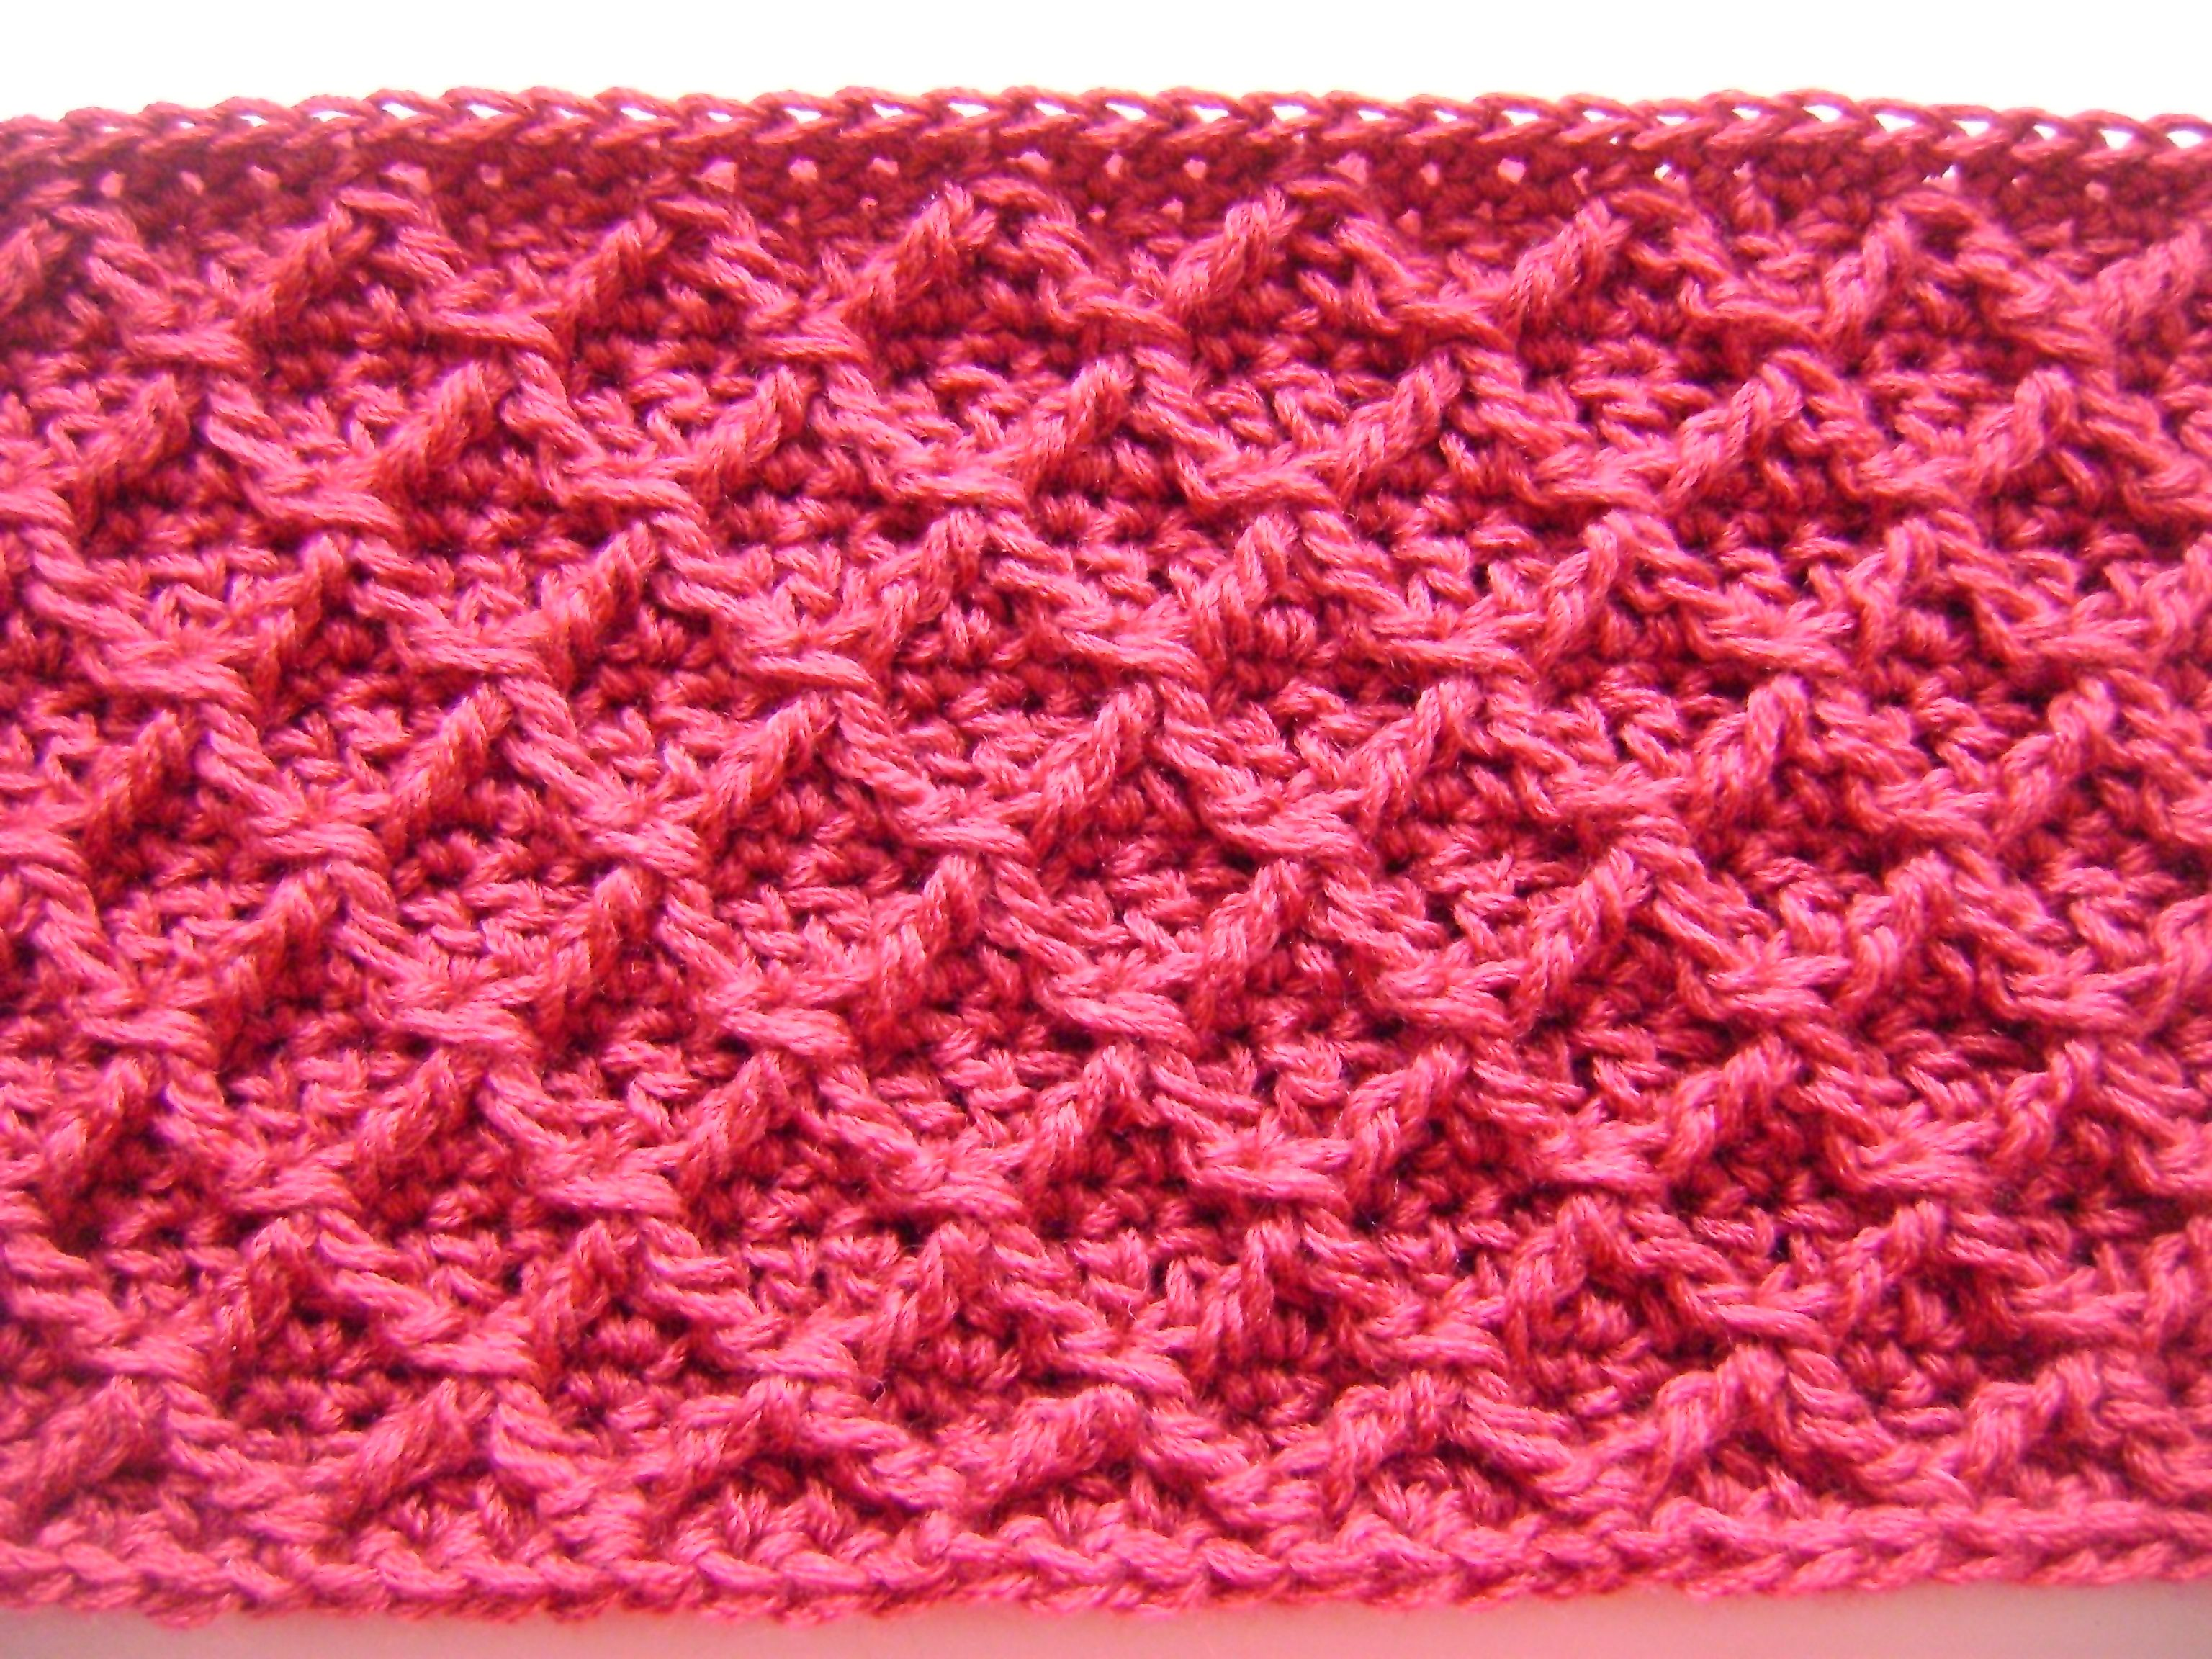 Crochet crochet diamond and crochet stitches crochet bankloansurffo Choice Image